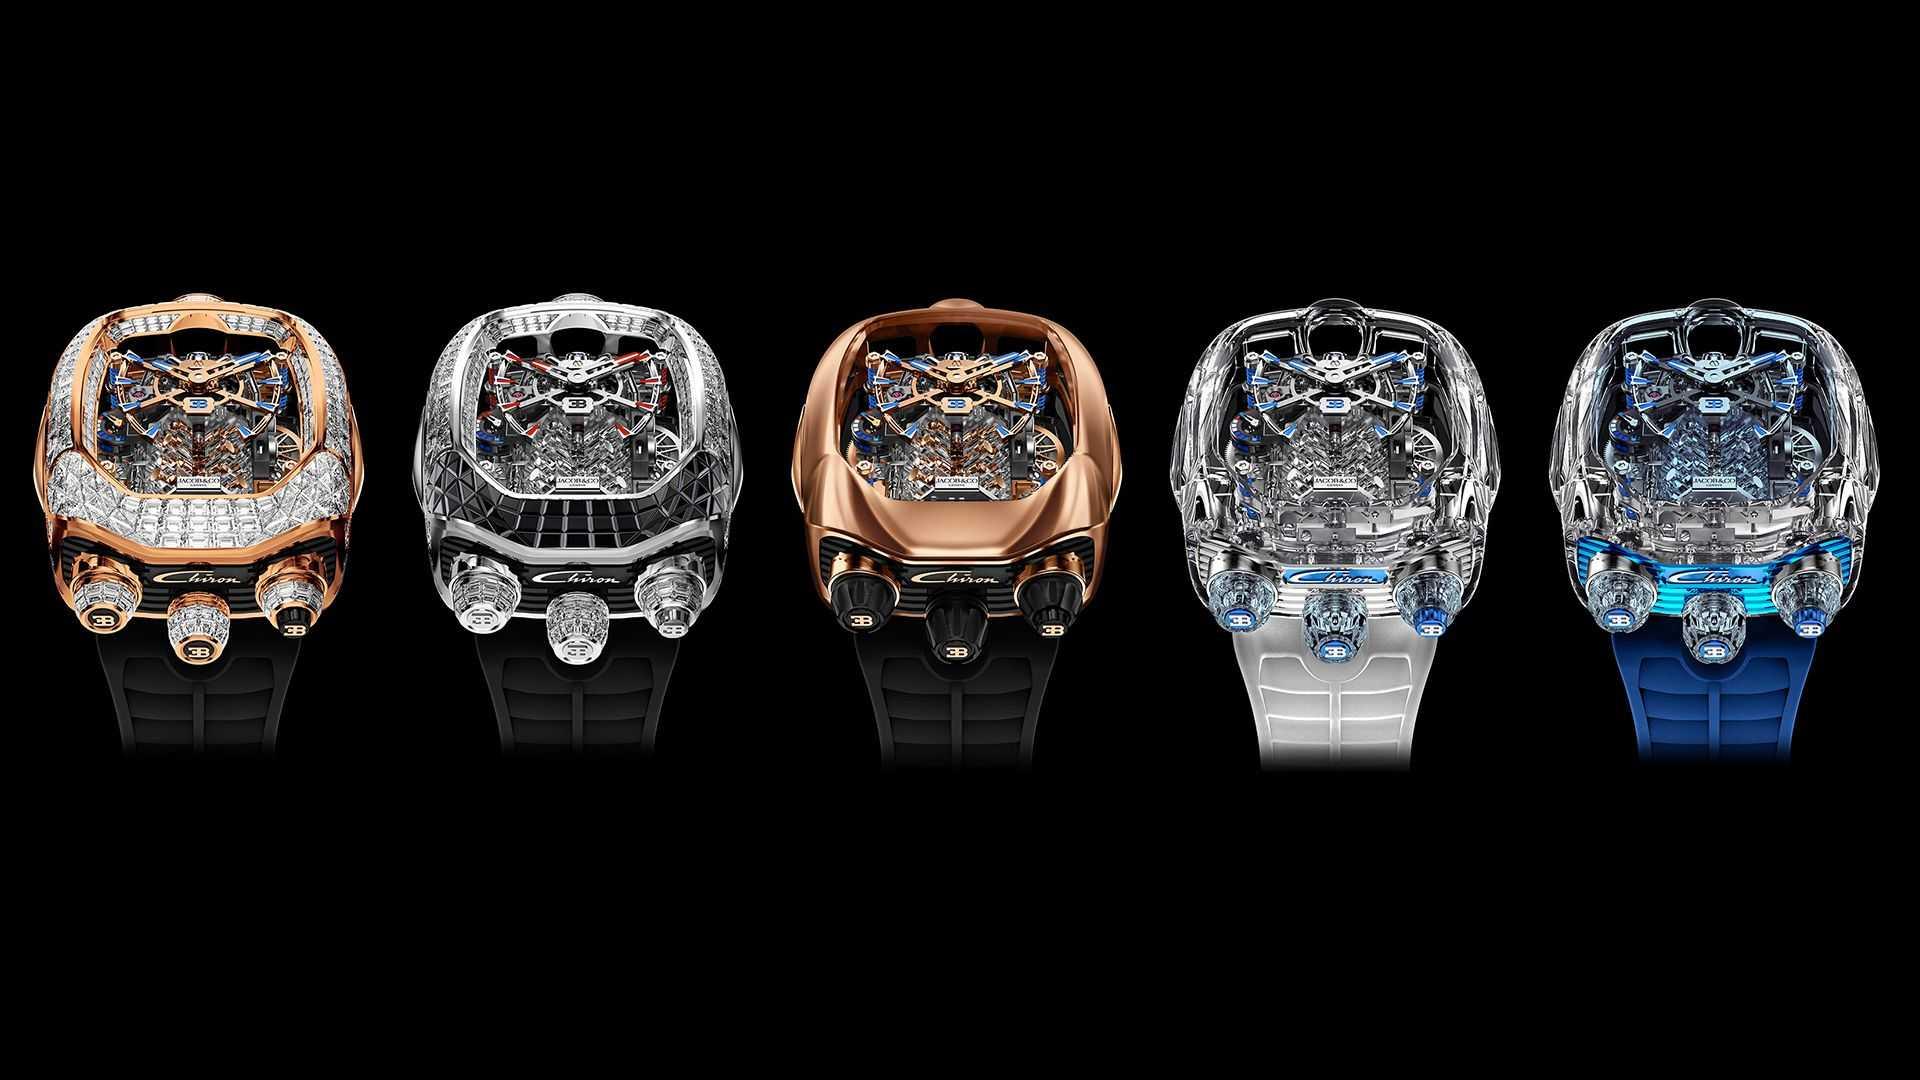 Jacob-Co-Bugatti-Chiron-Tourbillon-Watch-1